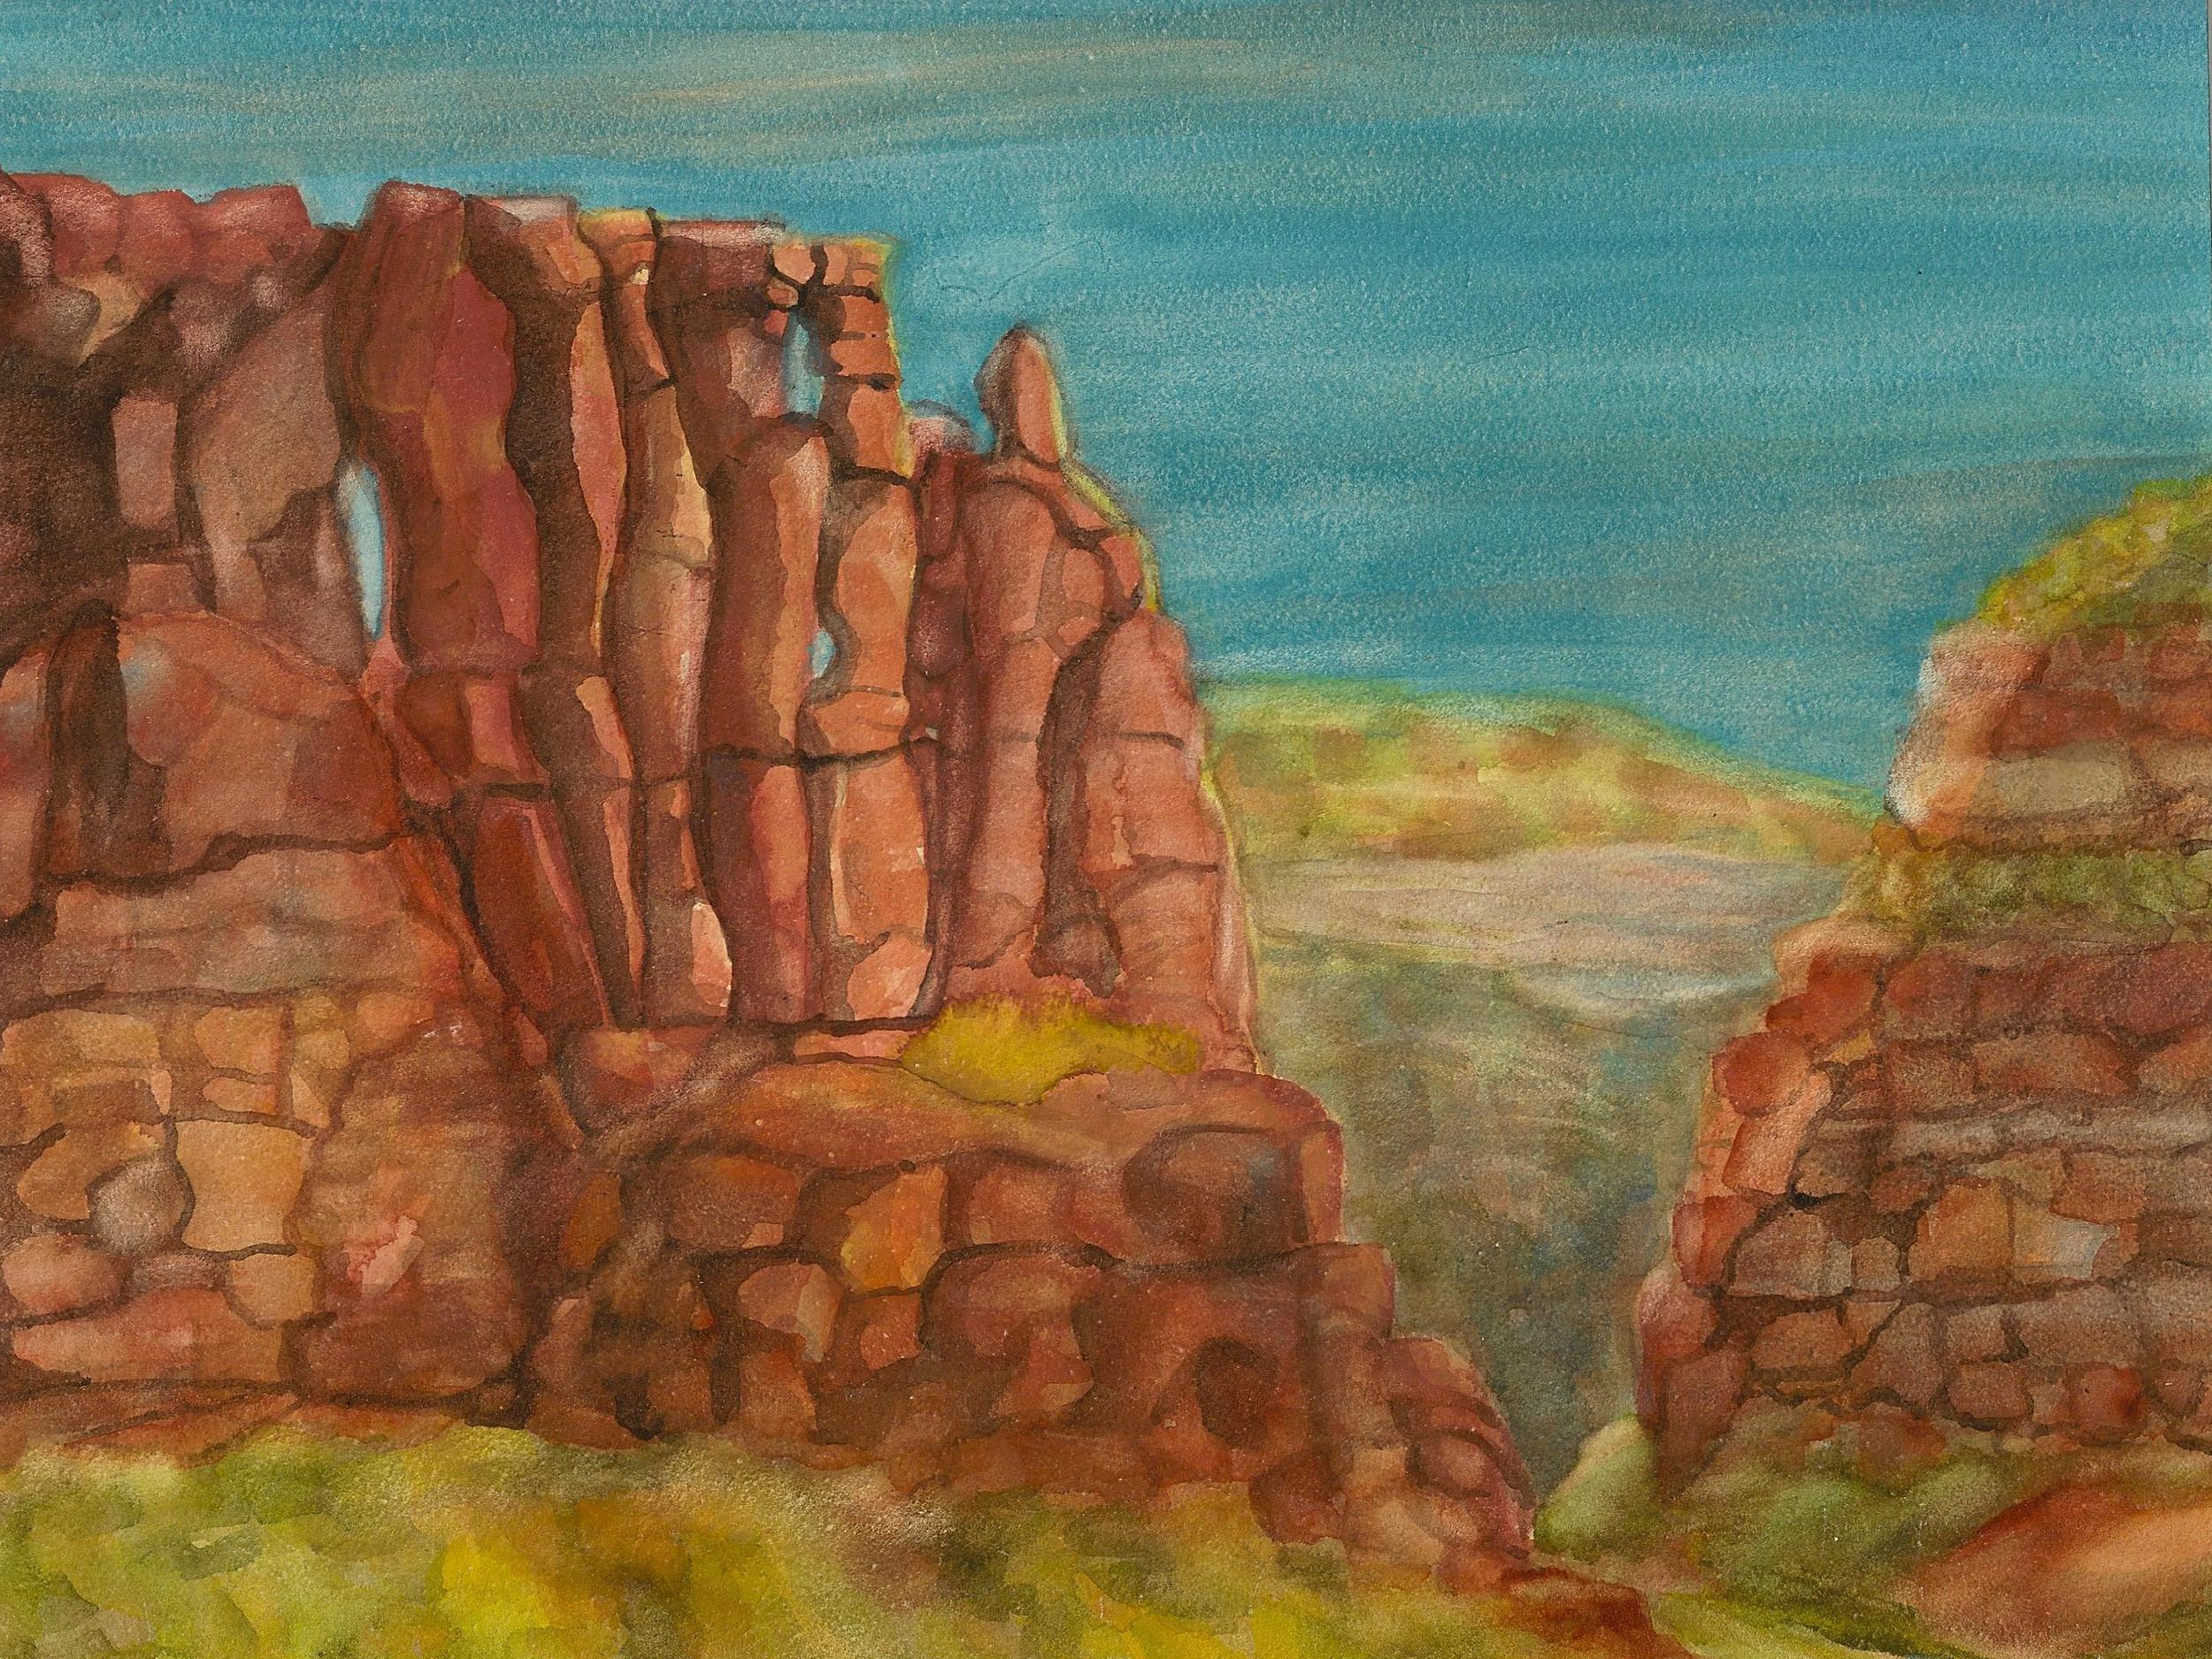 Mee Canyon